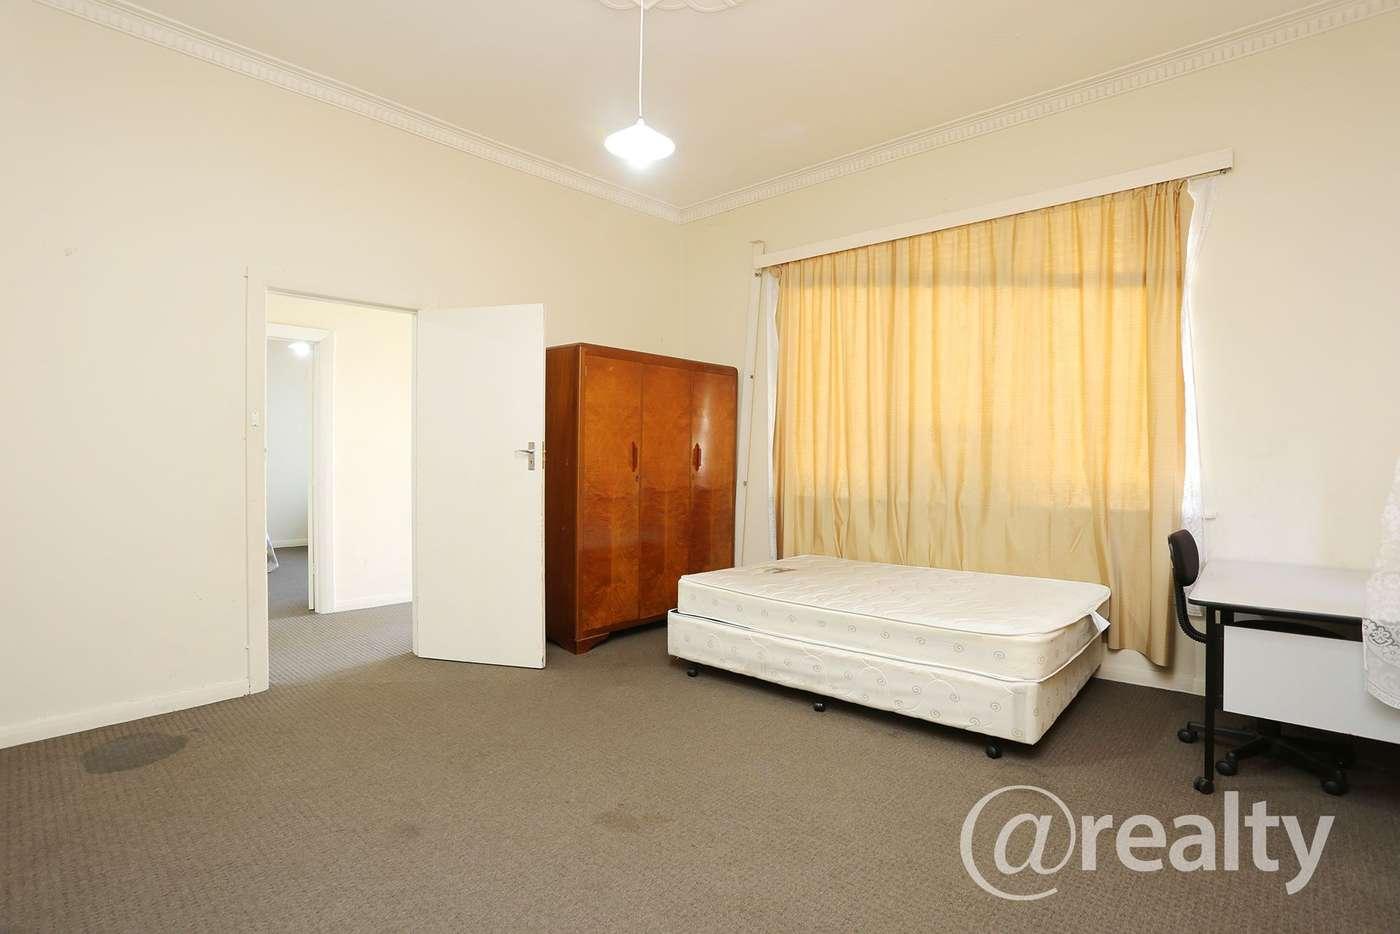 Sixth view of Homely house listing, 2 Durant Rd, Croydon Park SA 5008